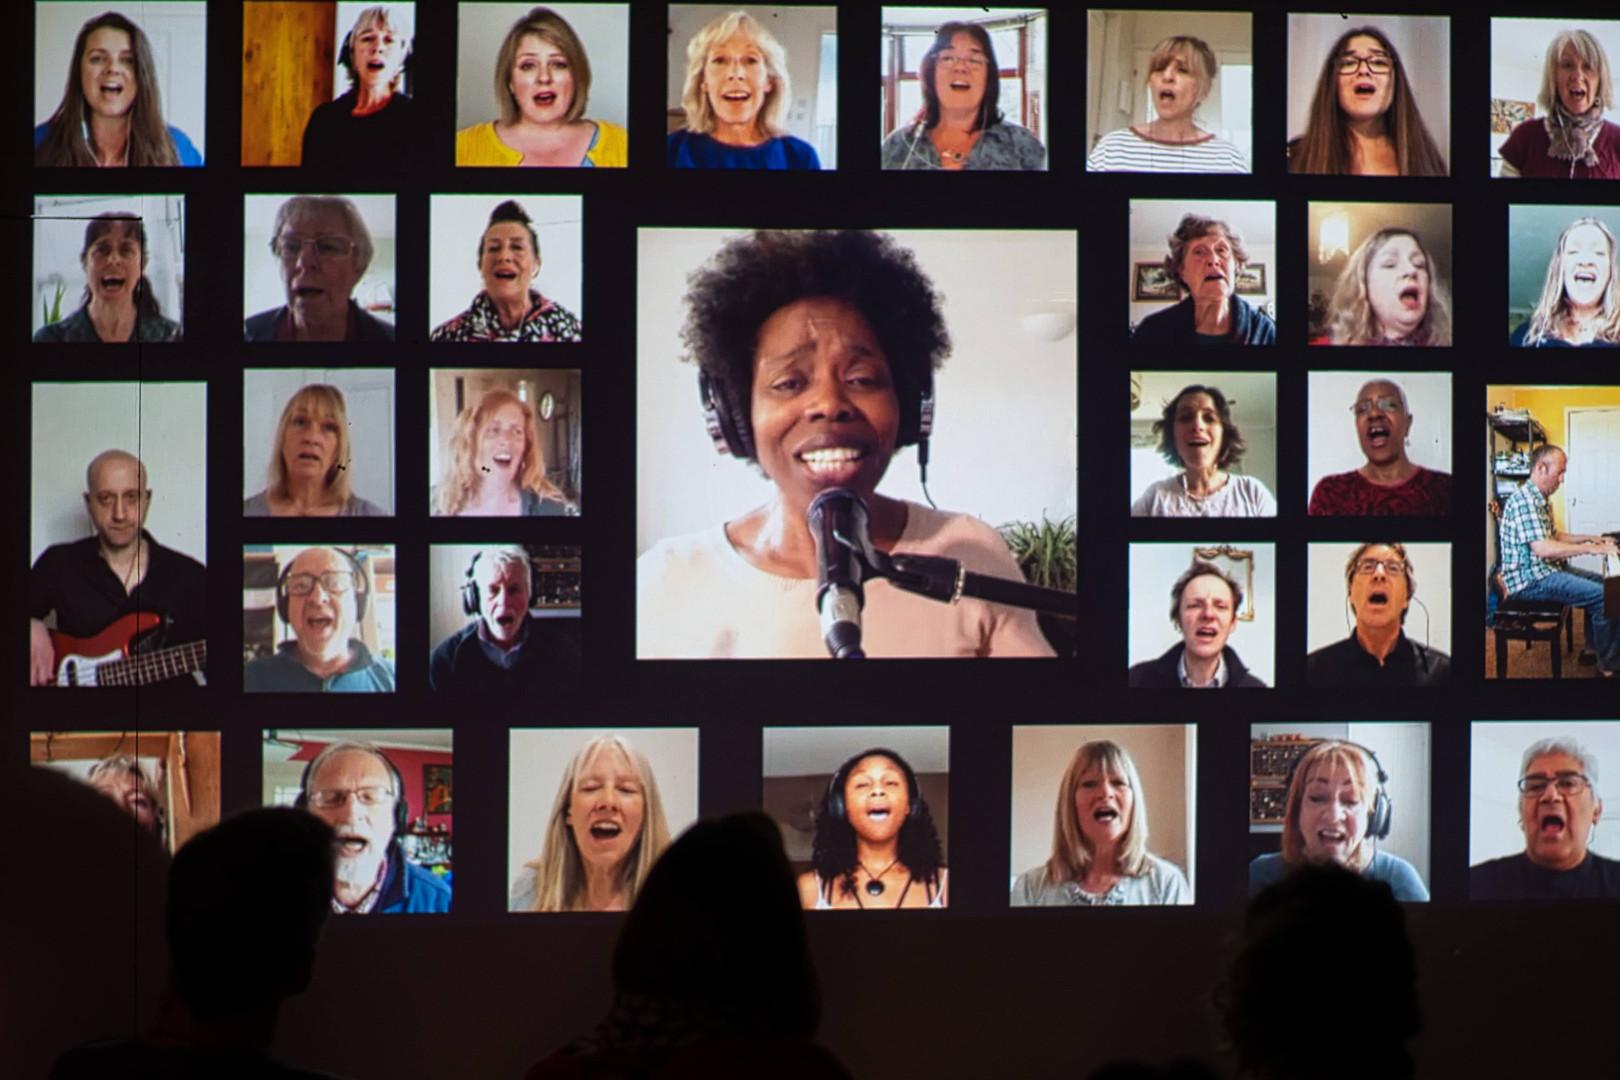 Virtual Performance by Falmouth Gospel C